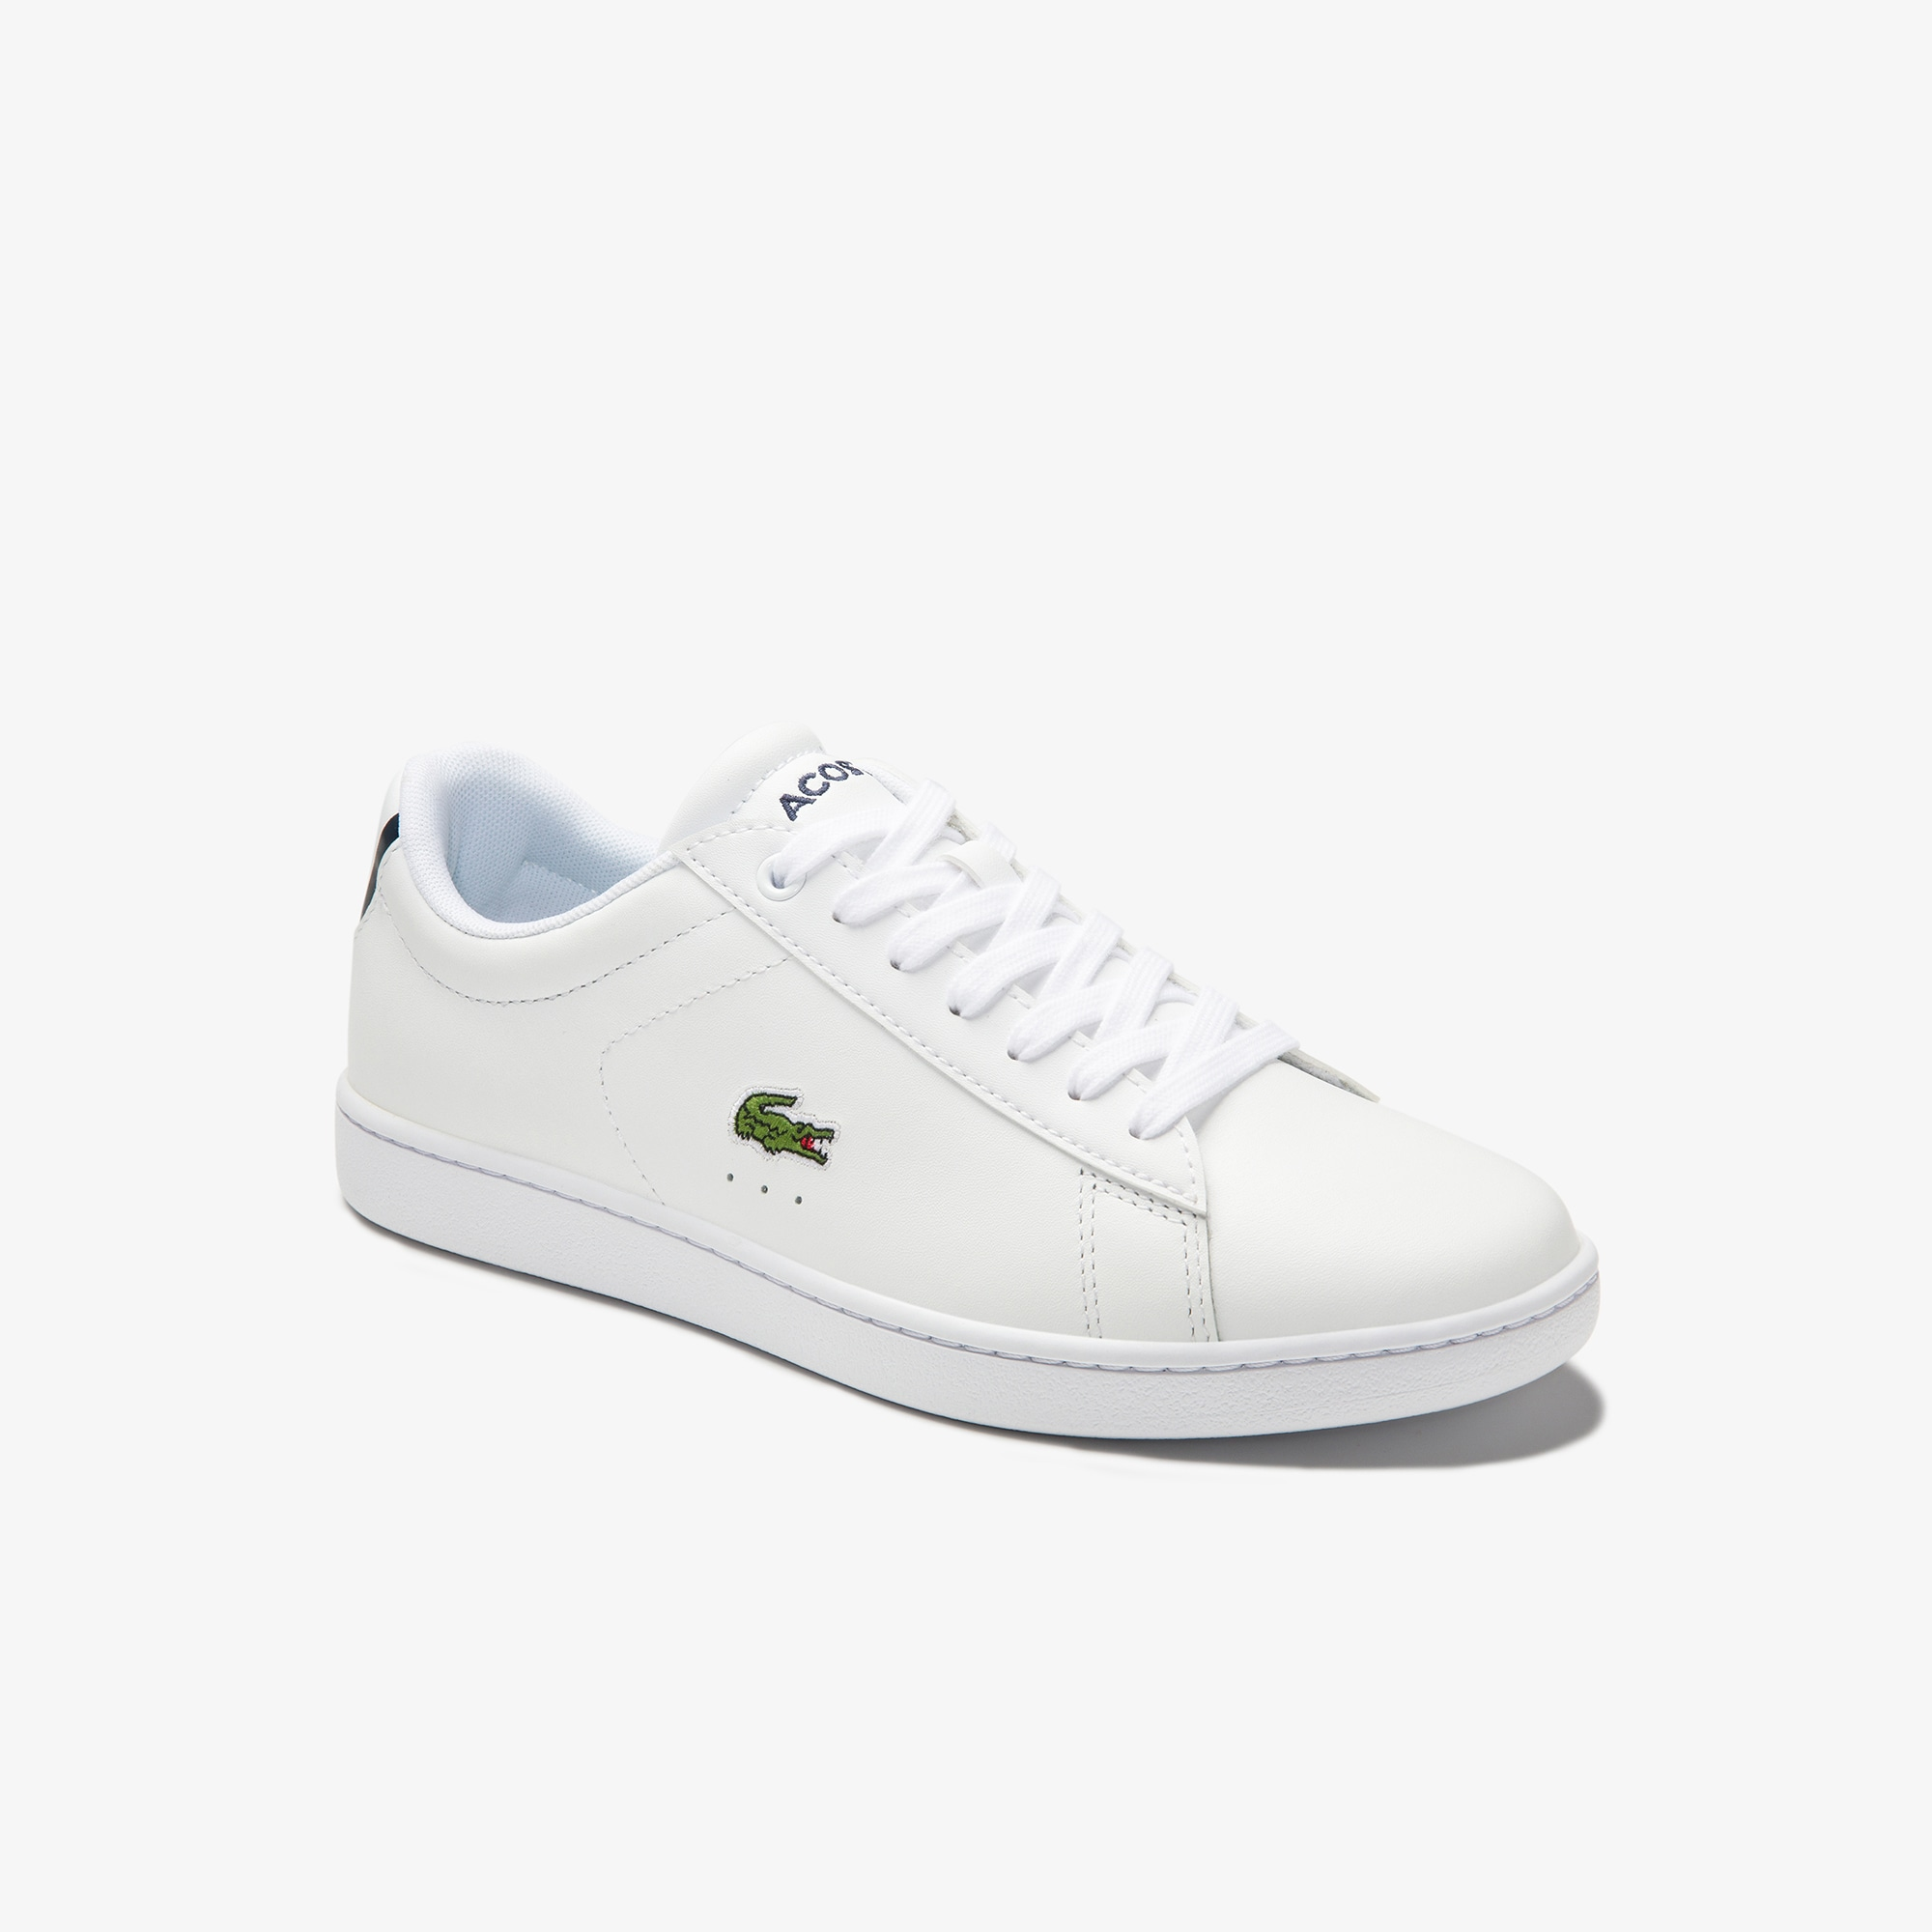 arrives 45ee0 4a684 Scarpe Lacoste da donna: sneaker, stivali, da città| LACOSTE